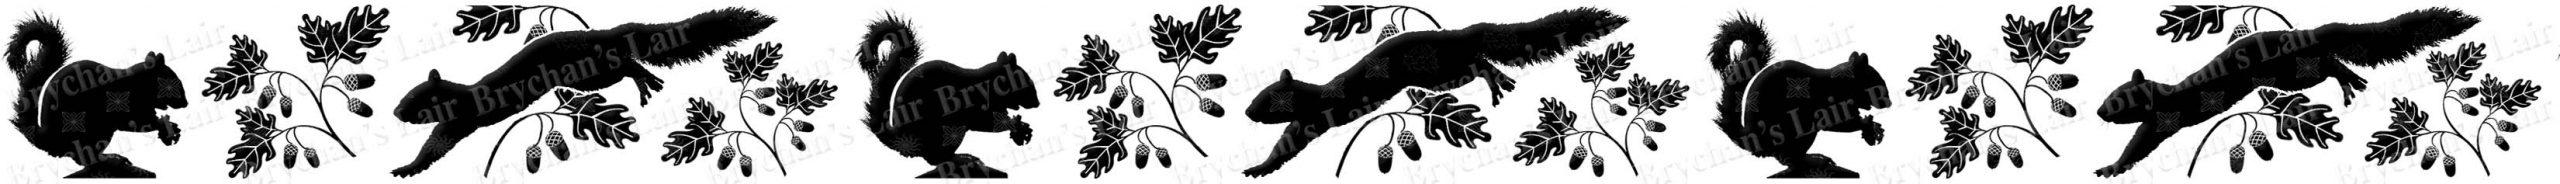 Squirrel Silhouette With Acorns Custom Printed Grosgrain Ribbon